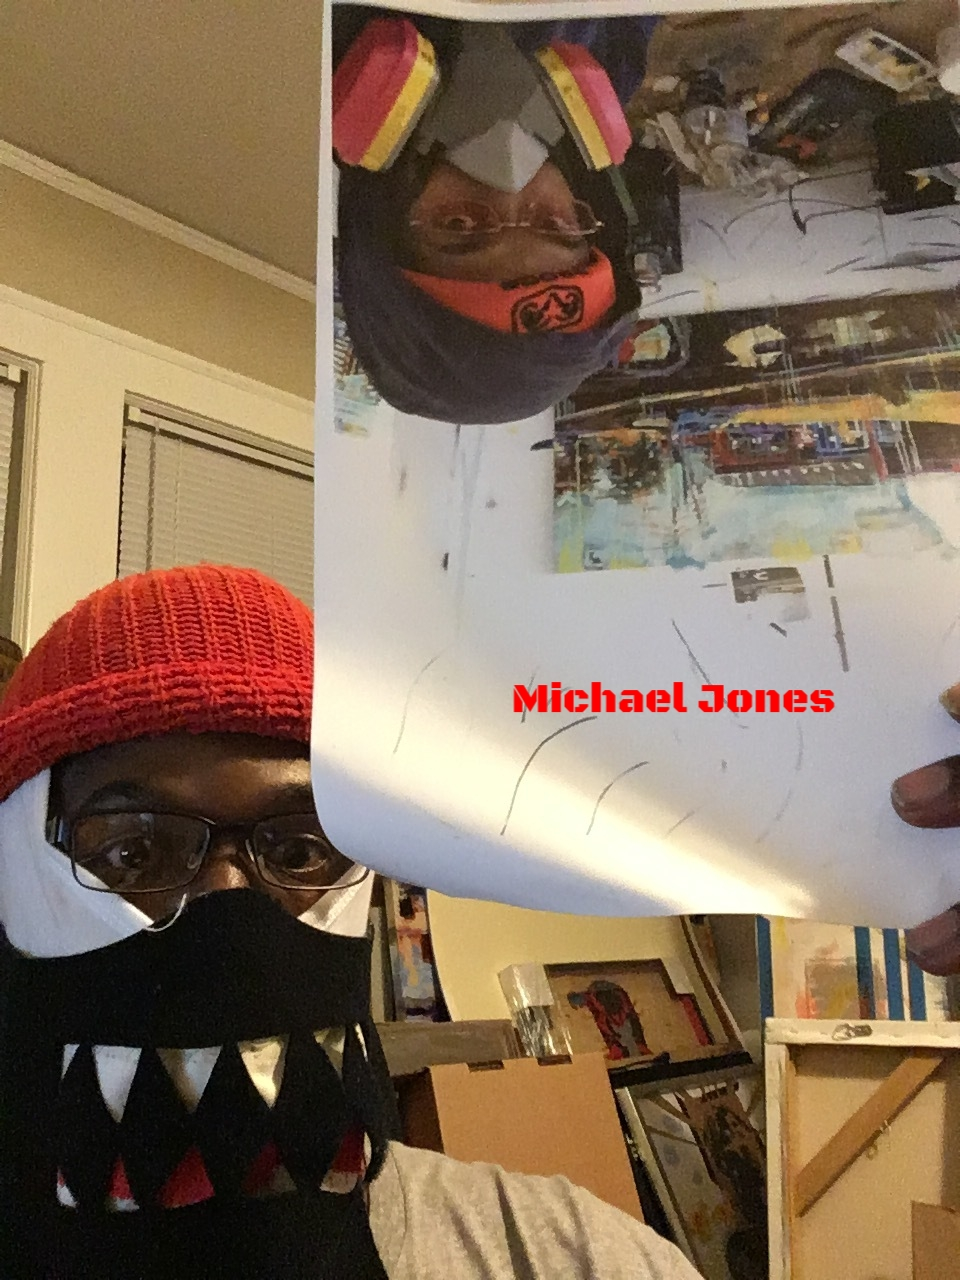 MichaelJones.JPG